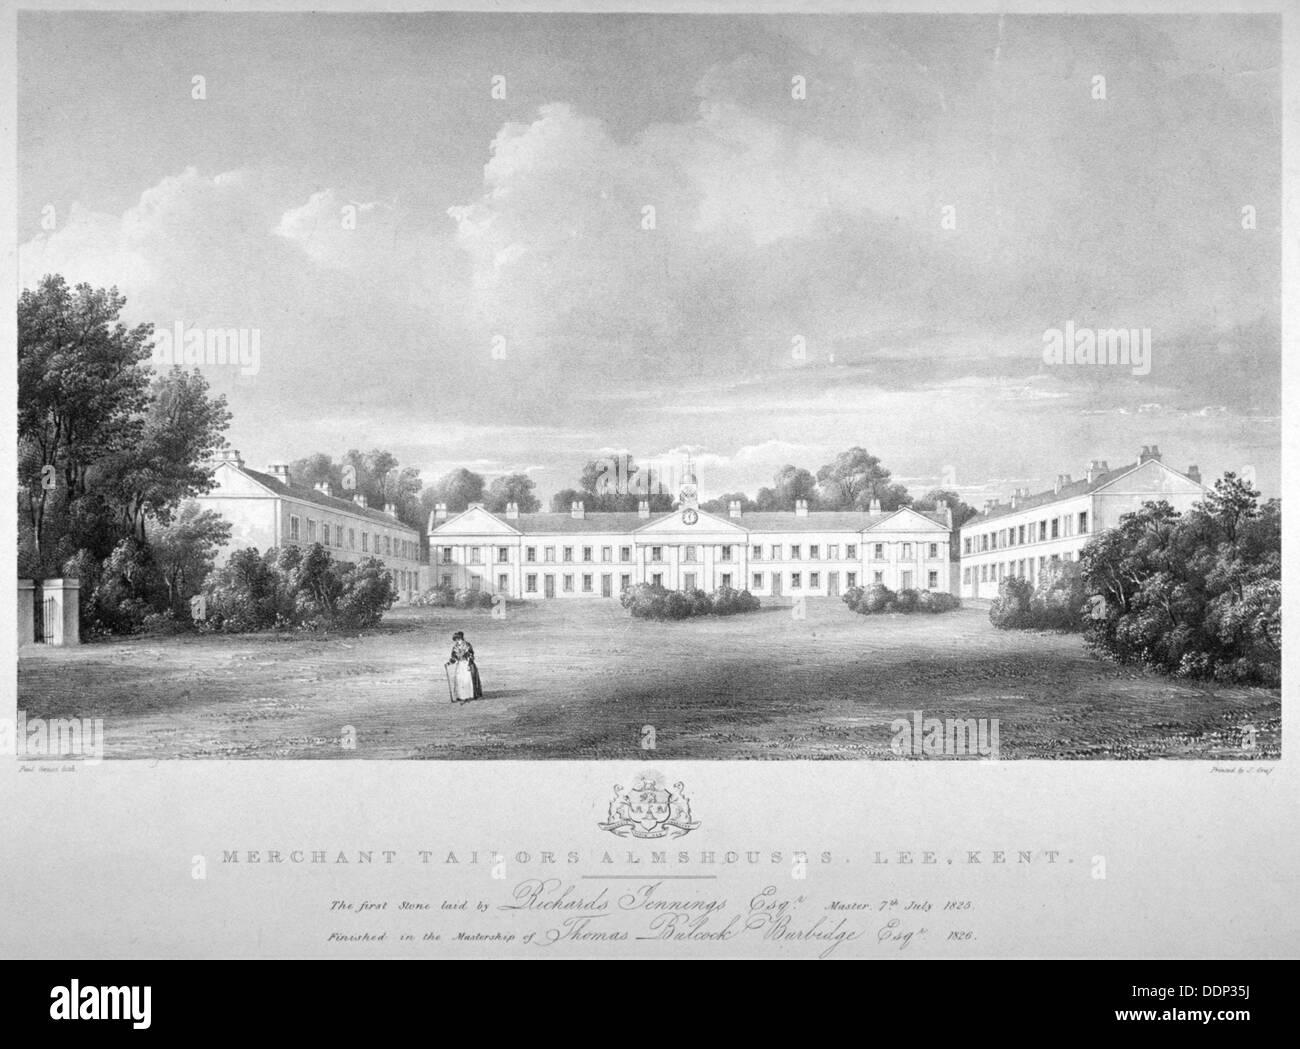 View of the Merchant Taylors' Almshouses on Lee High Road, Lewisham, London, 1826.                   Artist: Paul Stock Photo